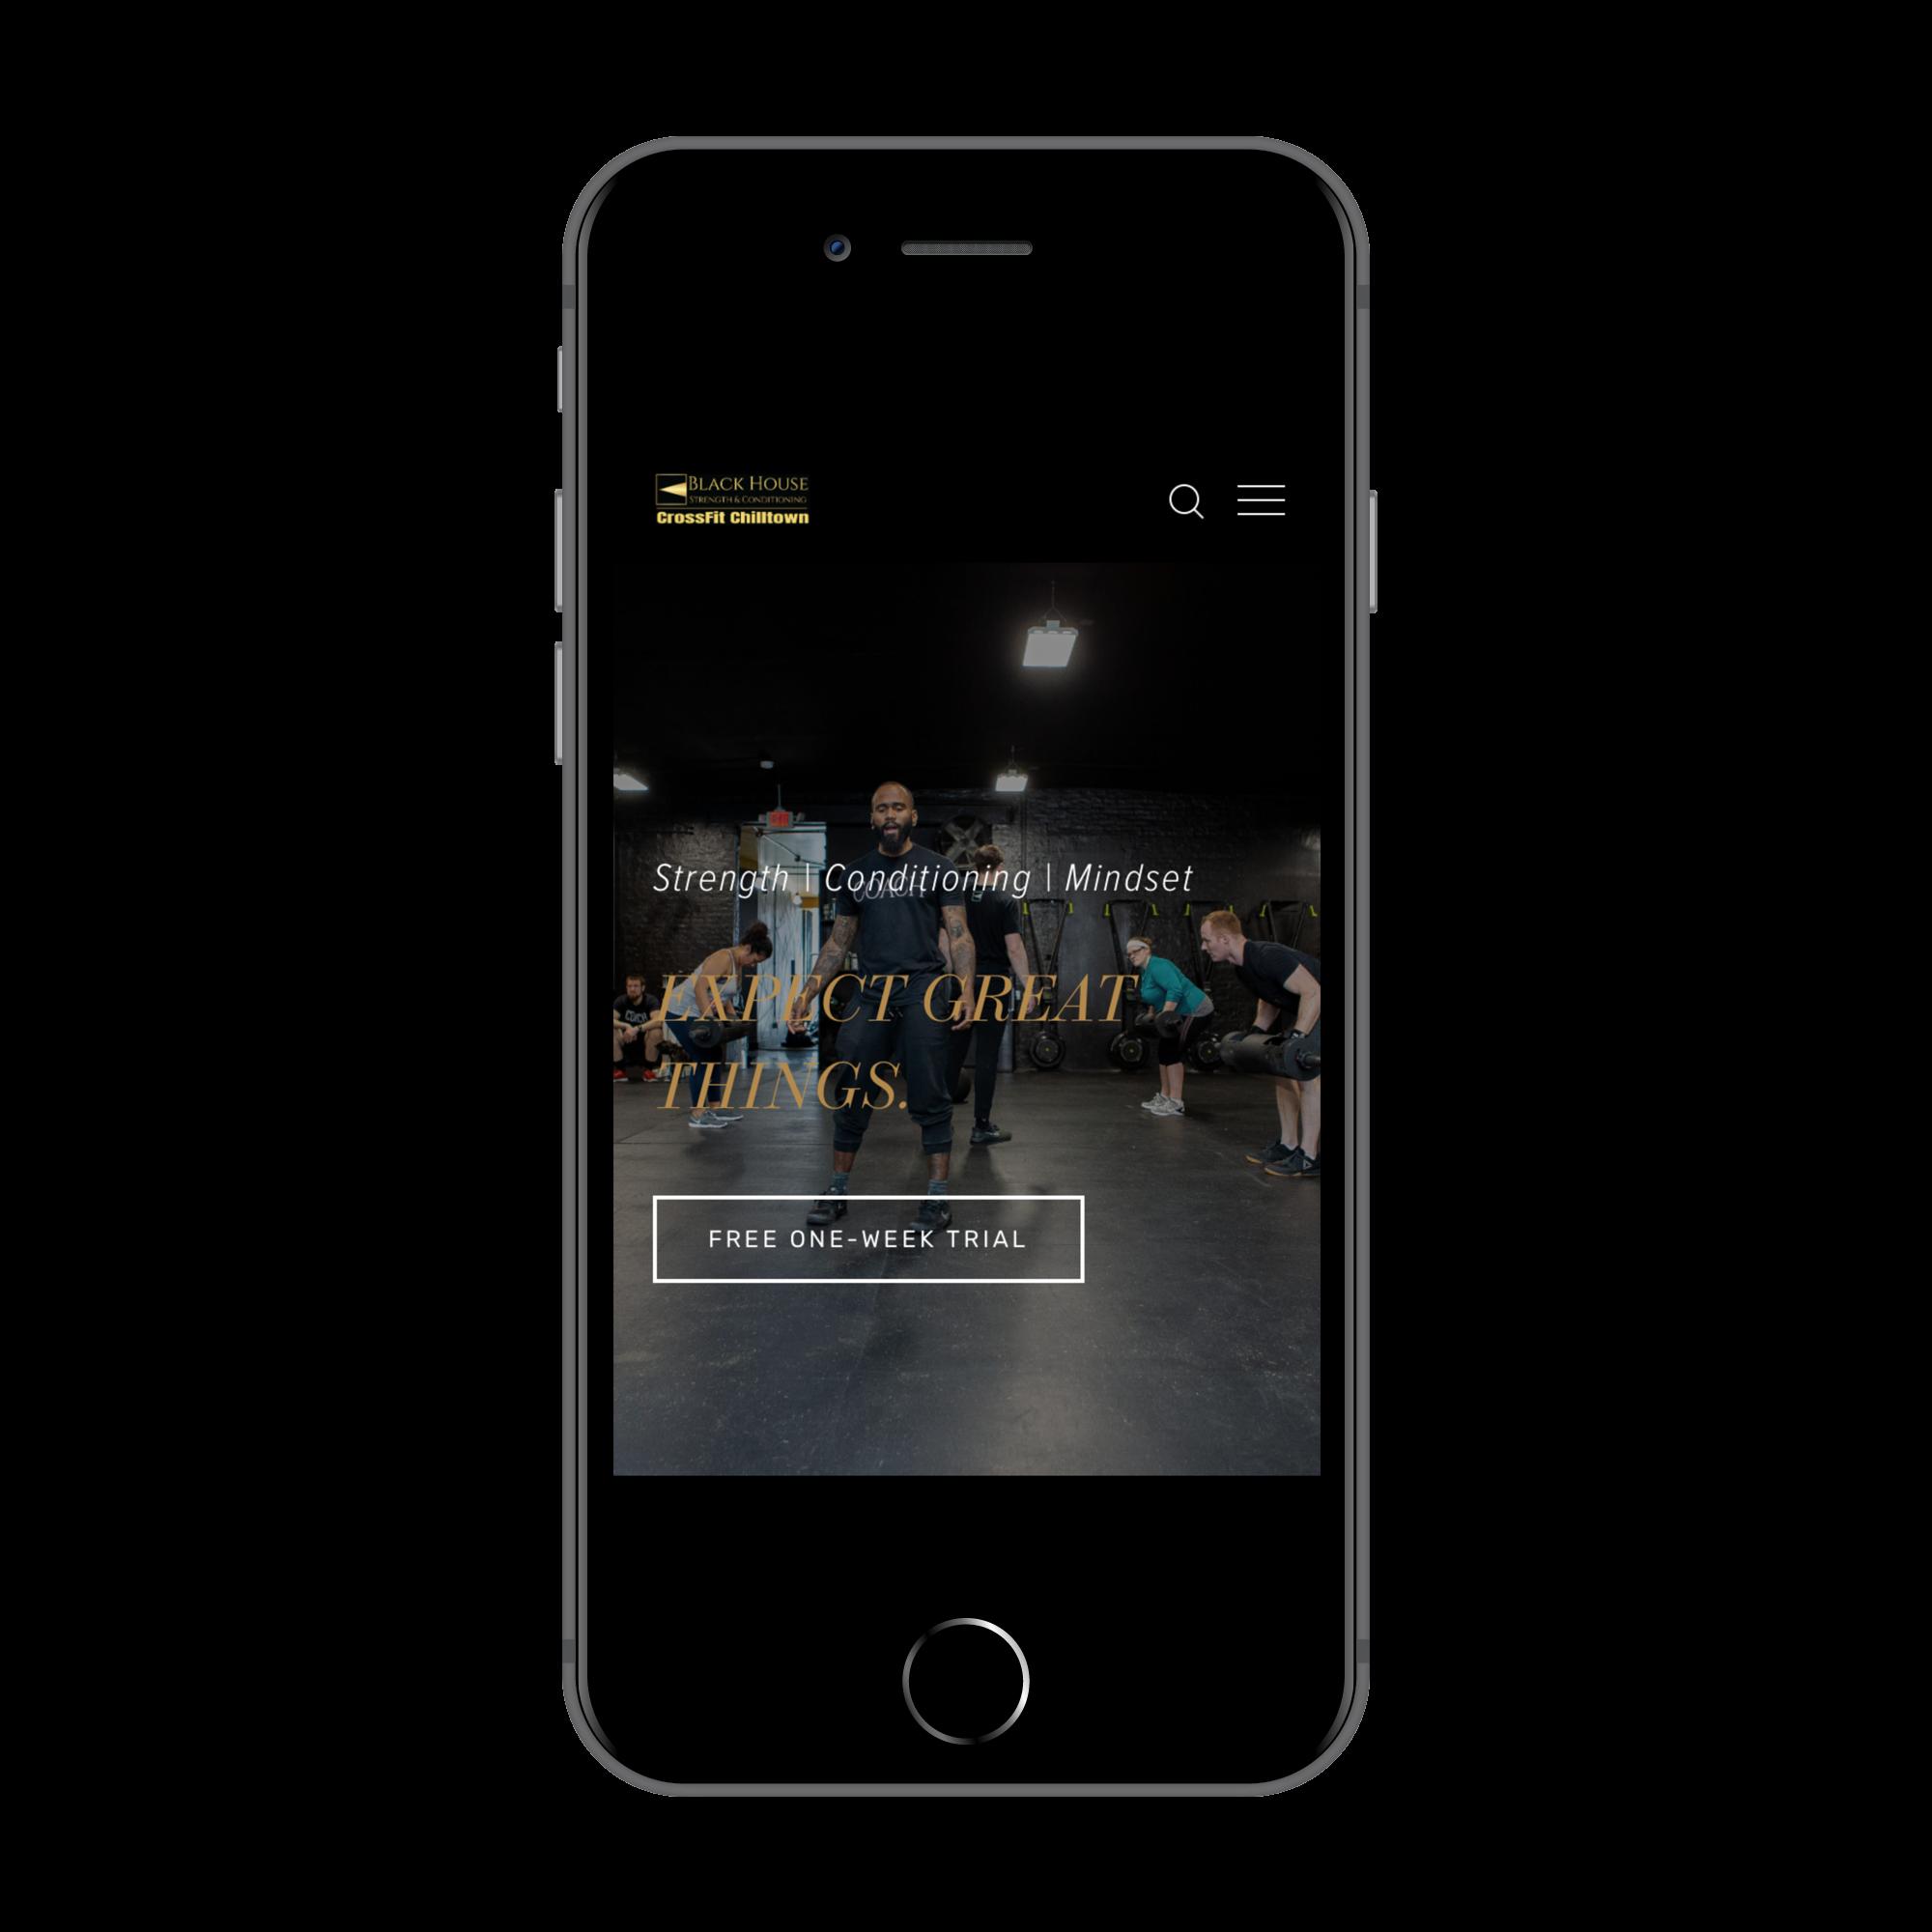 Screen Shot 2019-05-08 at 4.21.54 PM_iphone8plusspacegrey_portrait.png